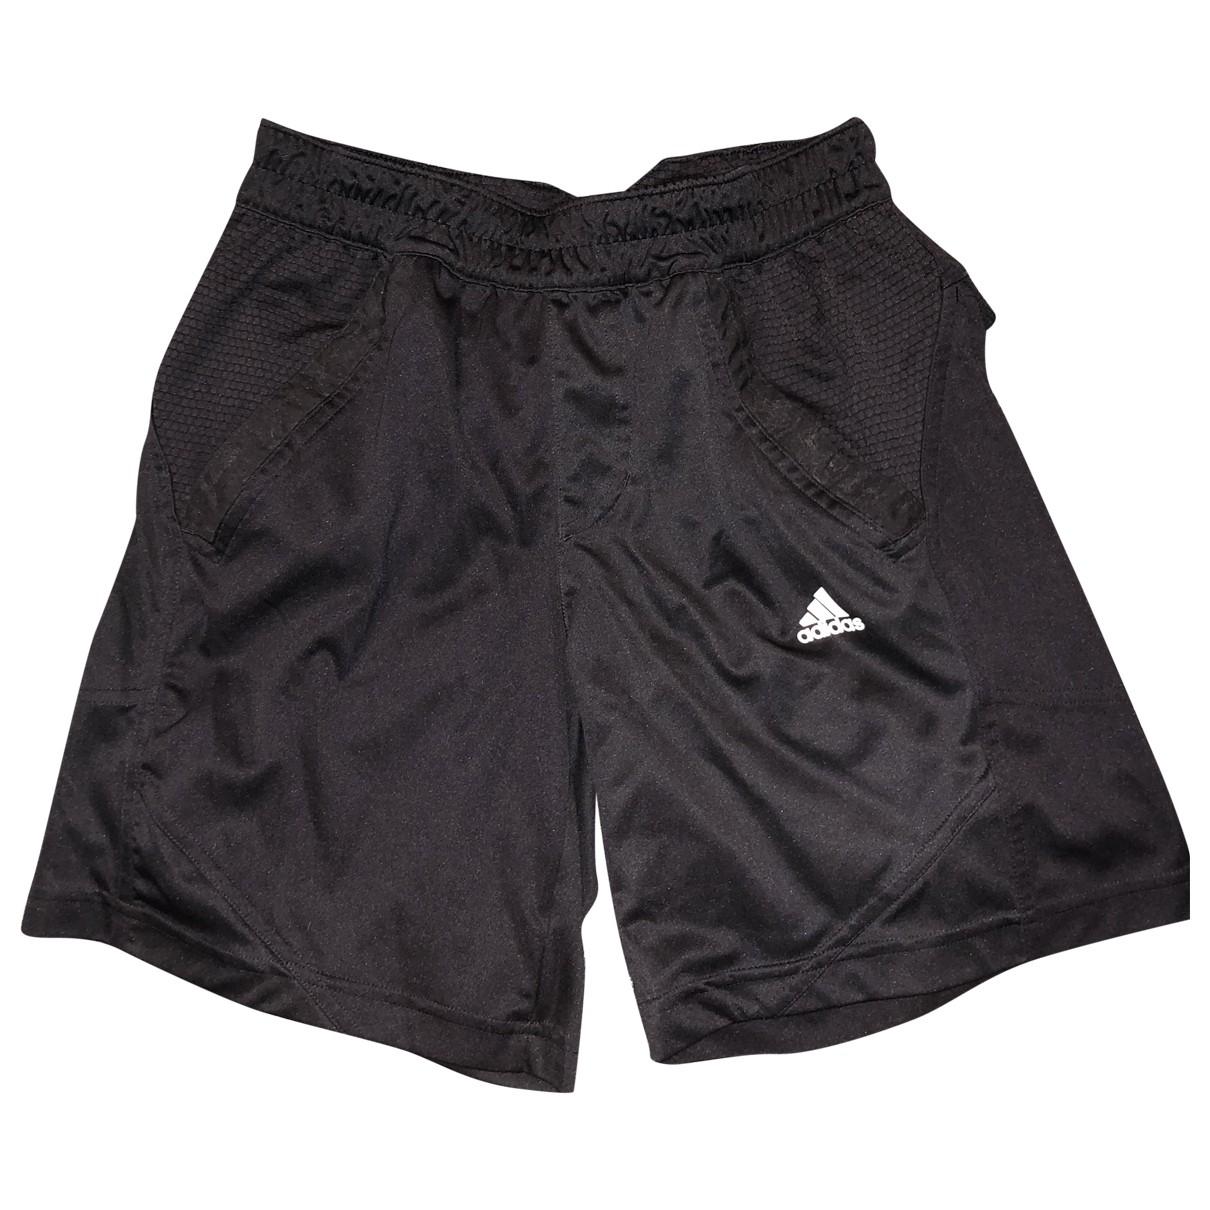 Adidas \N Black Shorts for Kids 12 years - XS FR